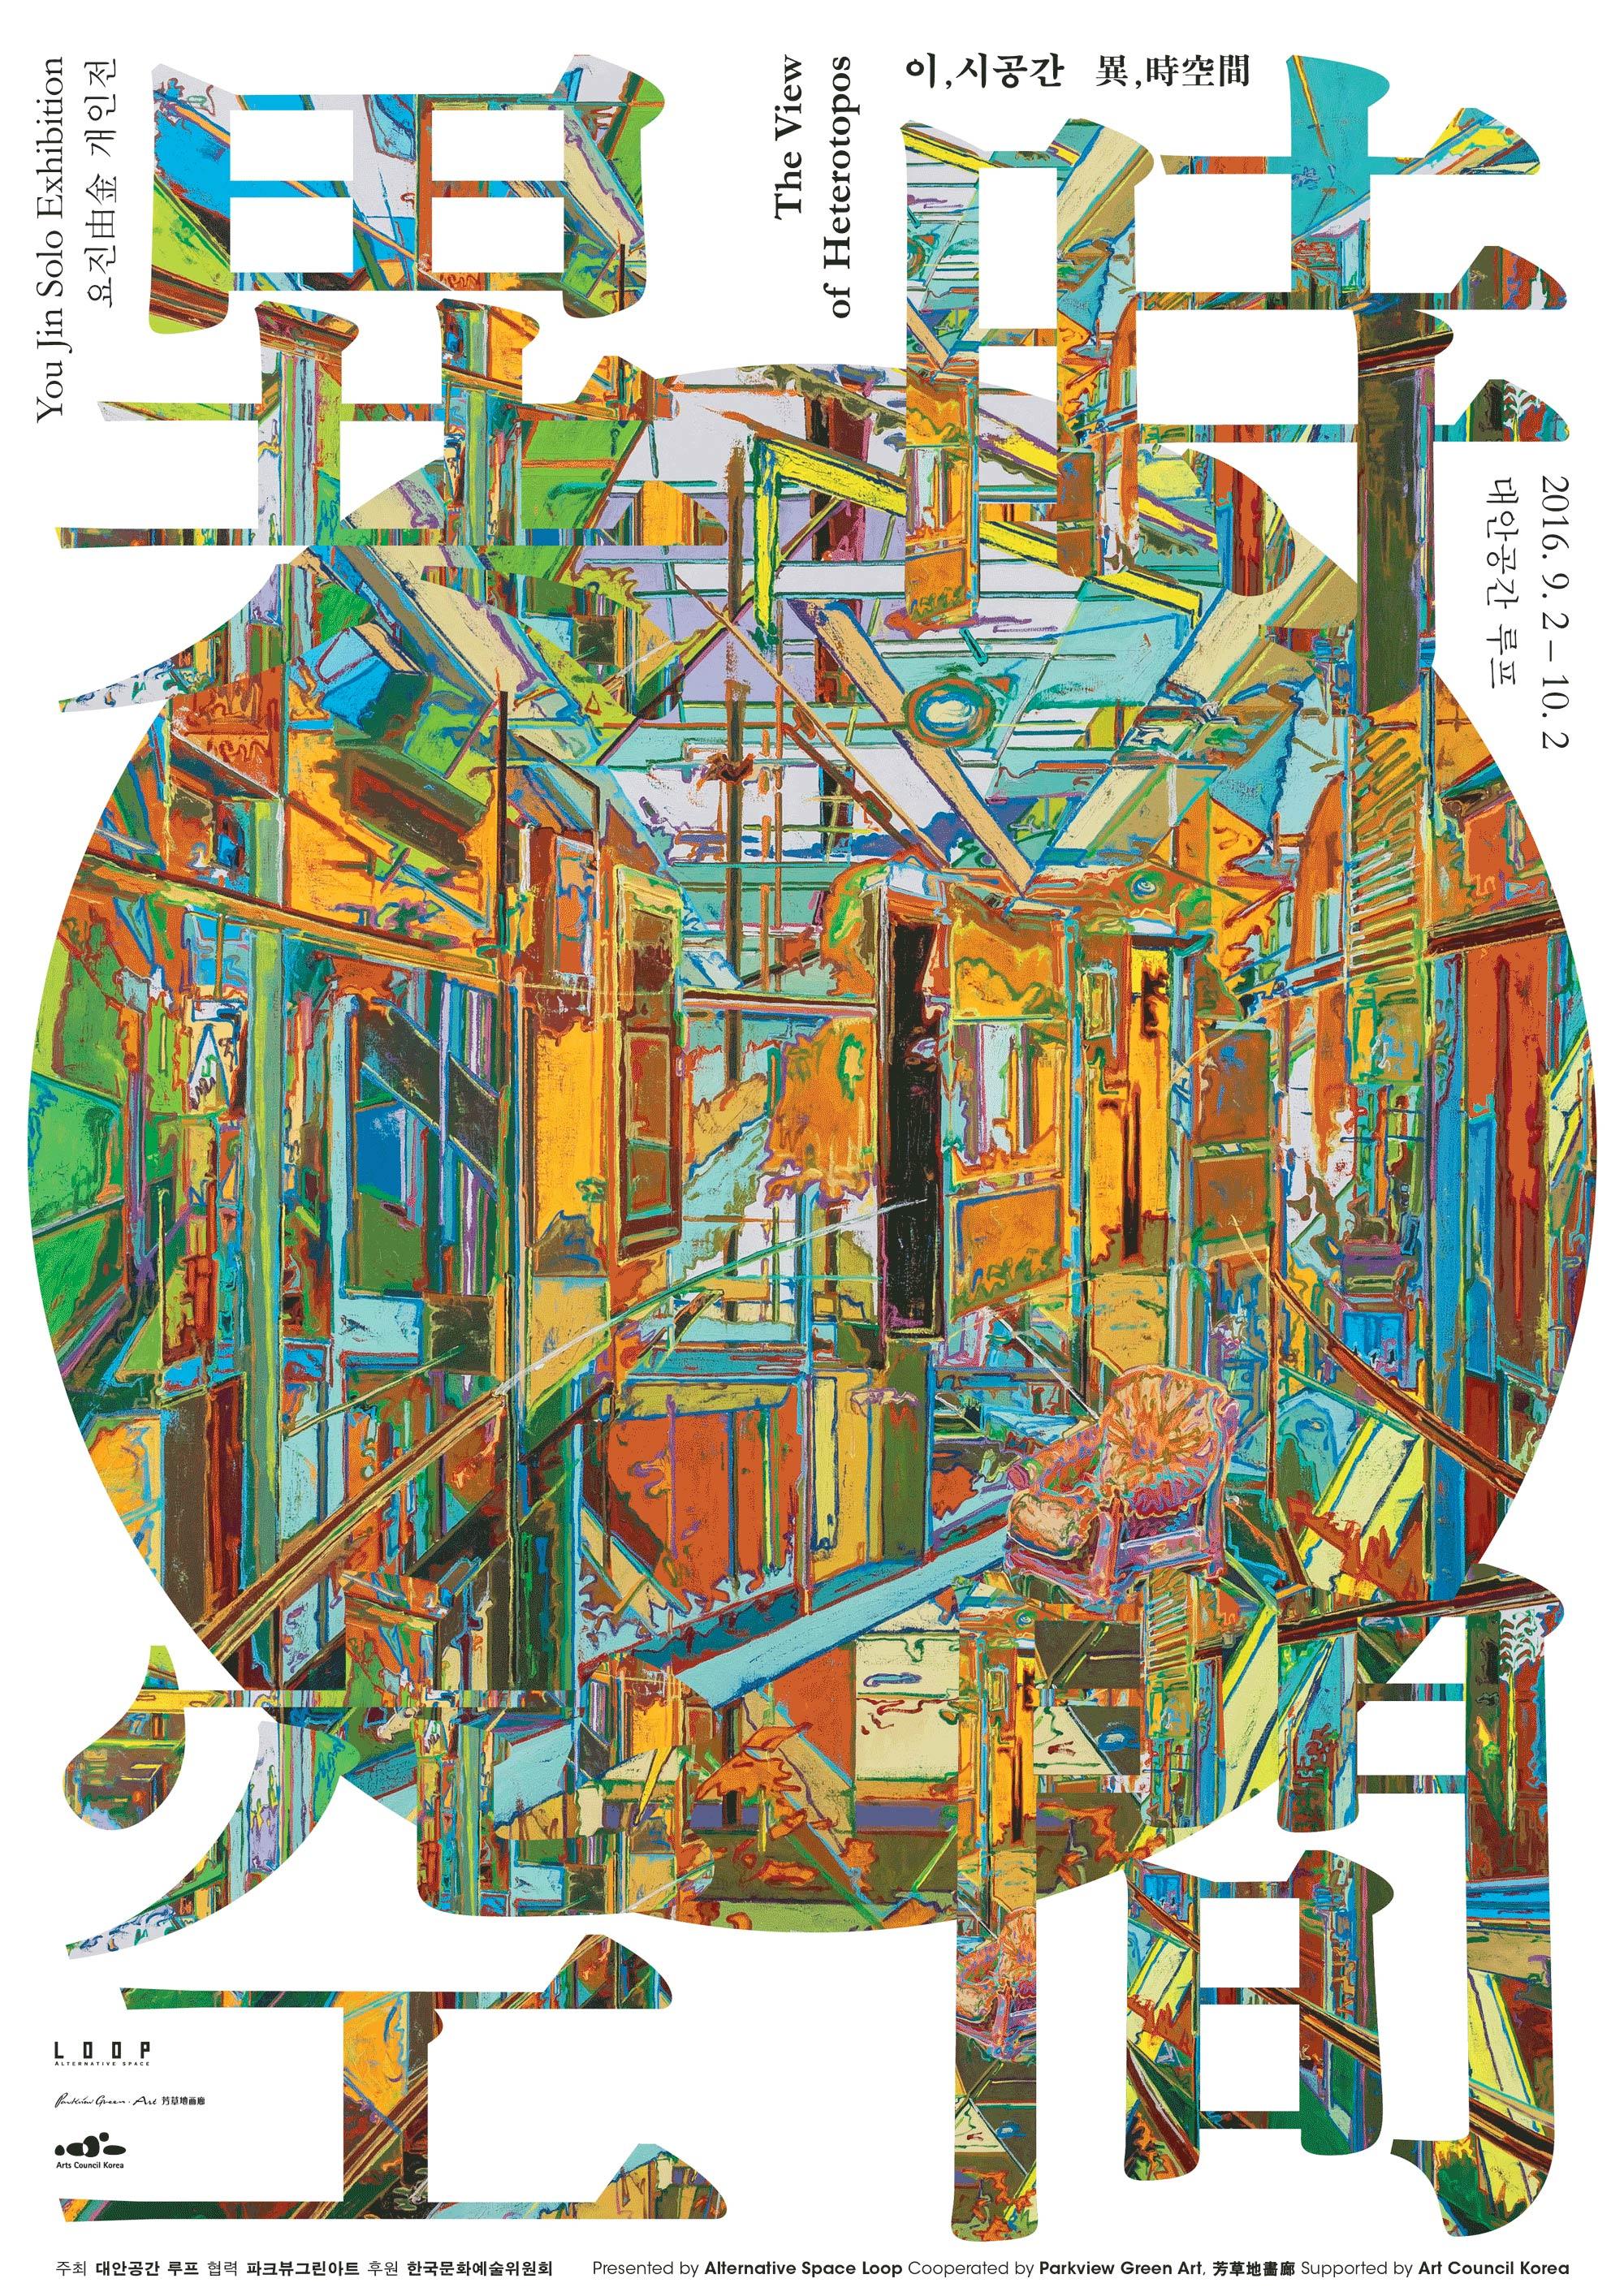 You Jin Solo Exhibition: The View of Heterotopos